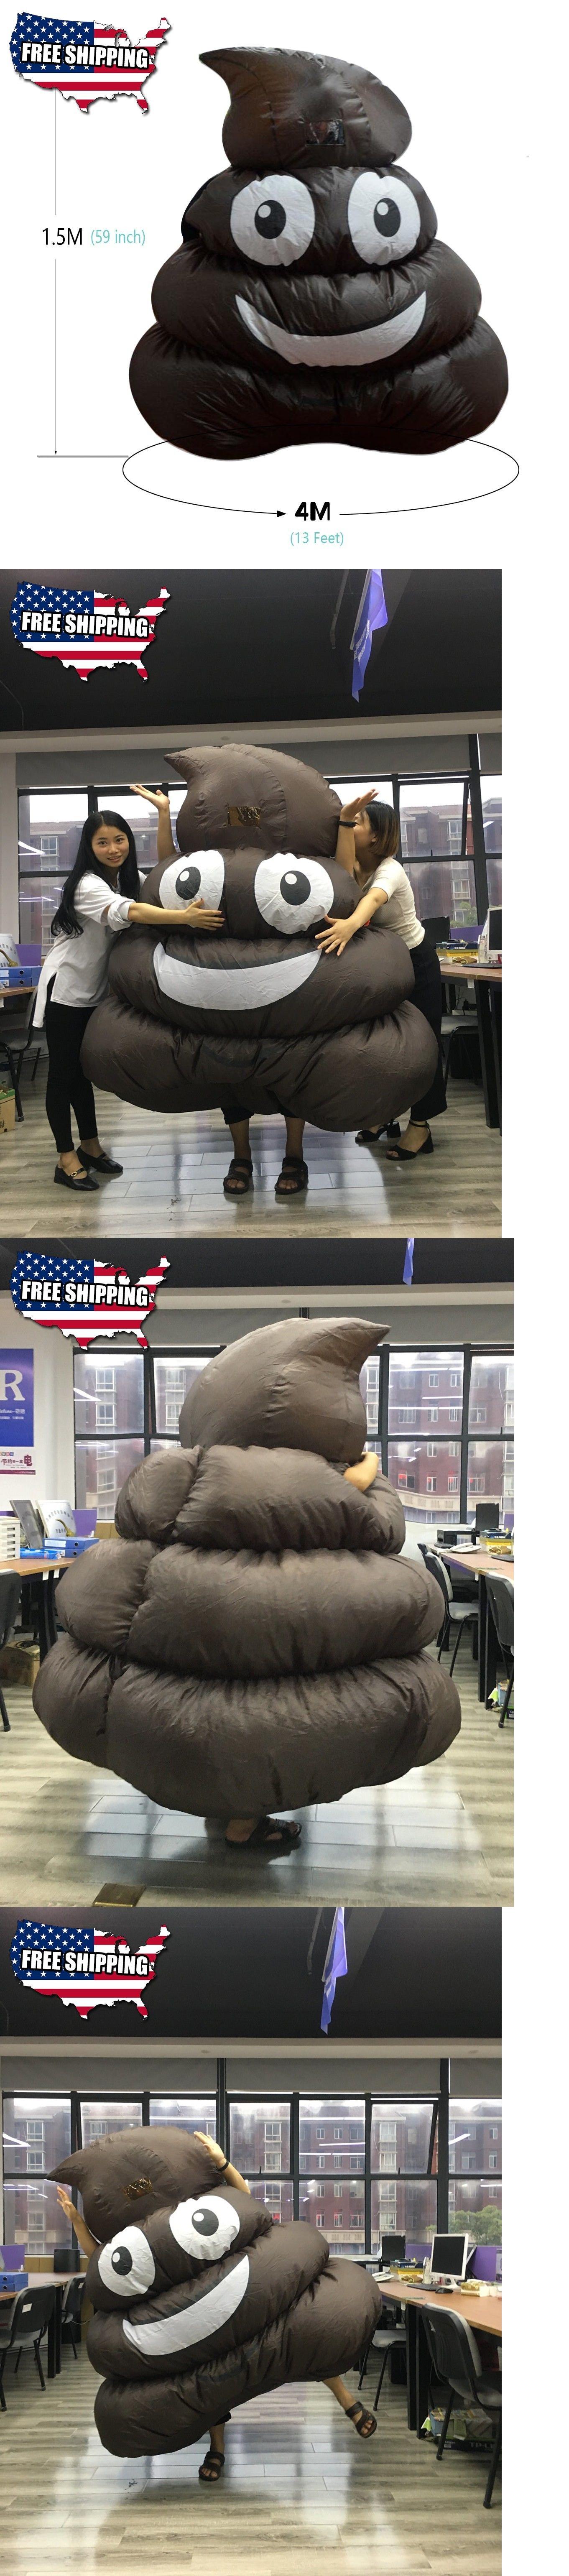 Other Backyard Games 159081: Dreamowl Inflatable Giant Poop Emoji ...